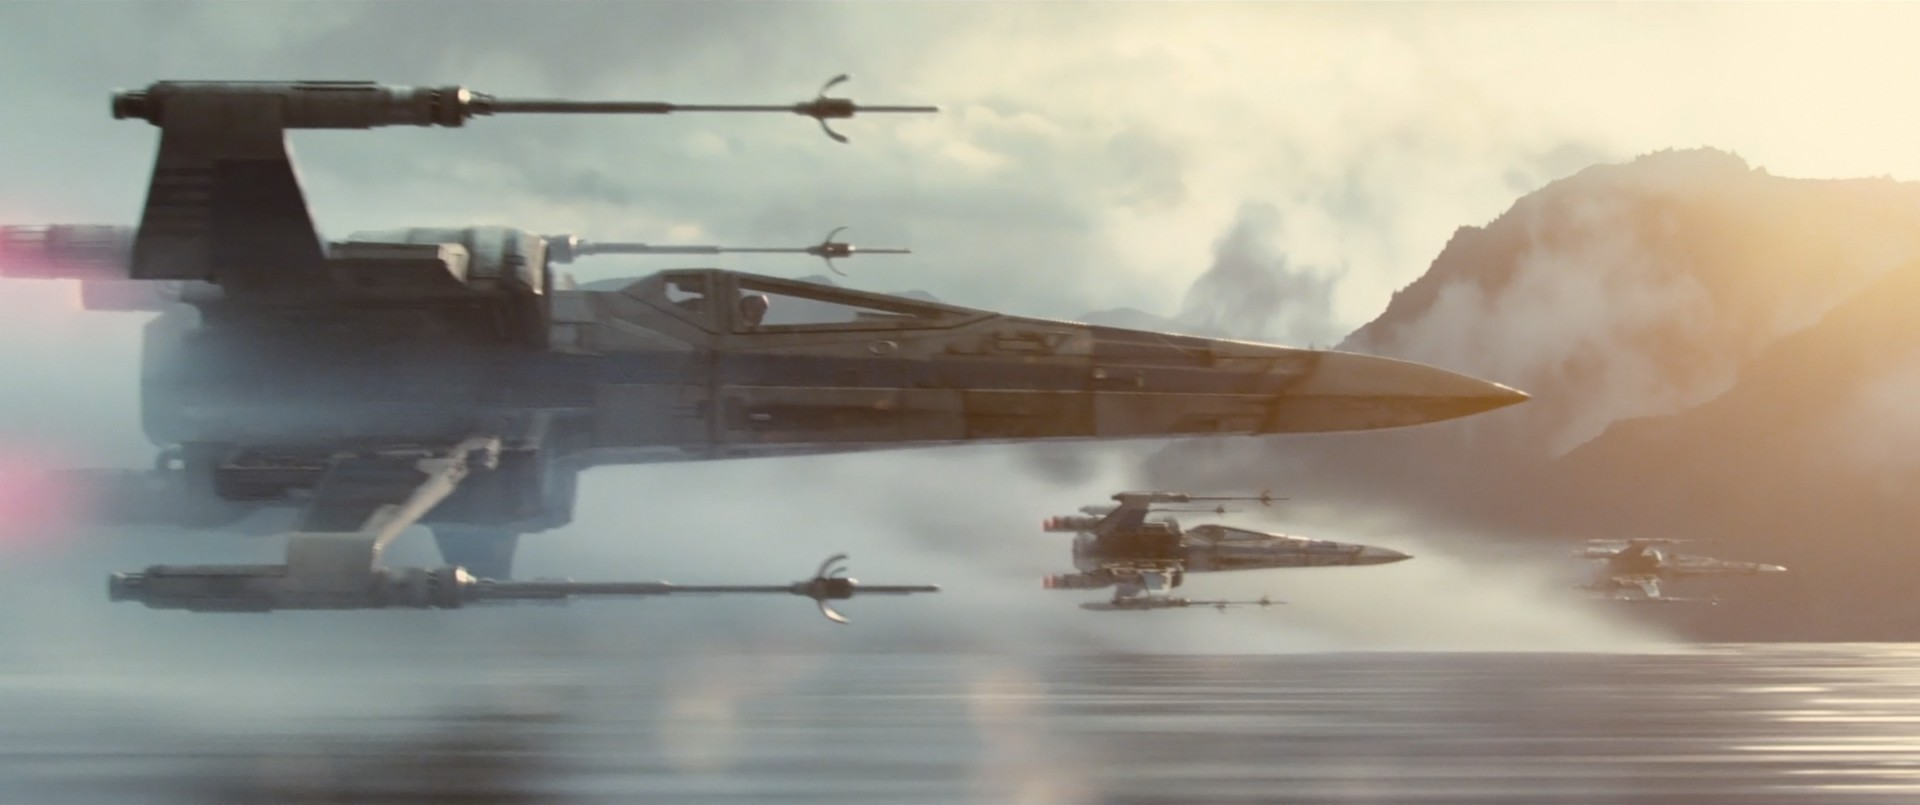 https://www.starwars-universe.com/images/actualites/disneylogie/teaser/escadron-x-wing.jpg